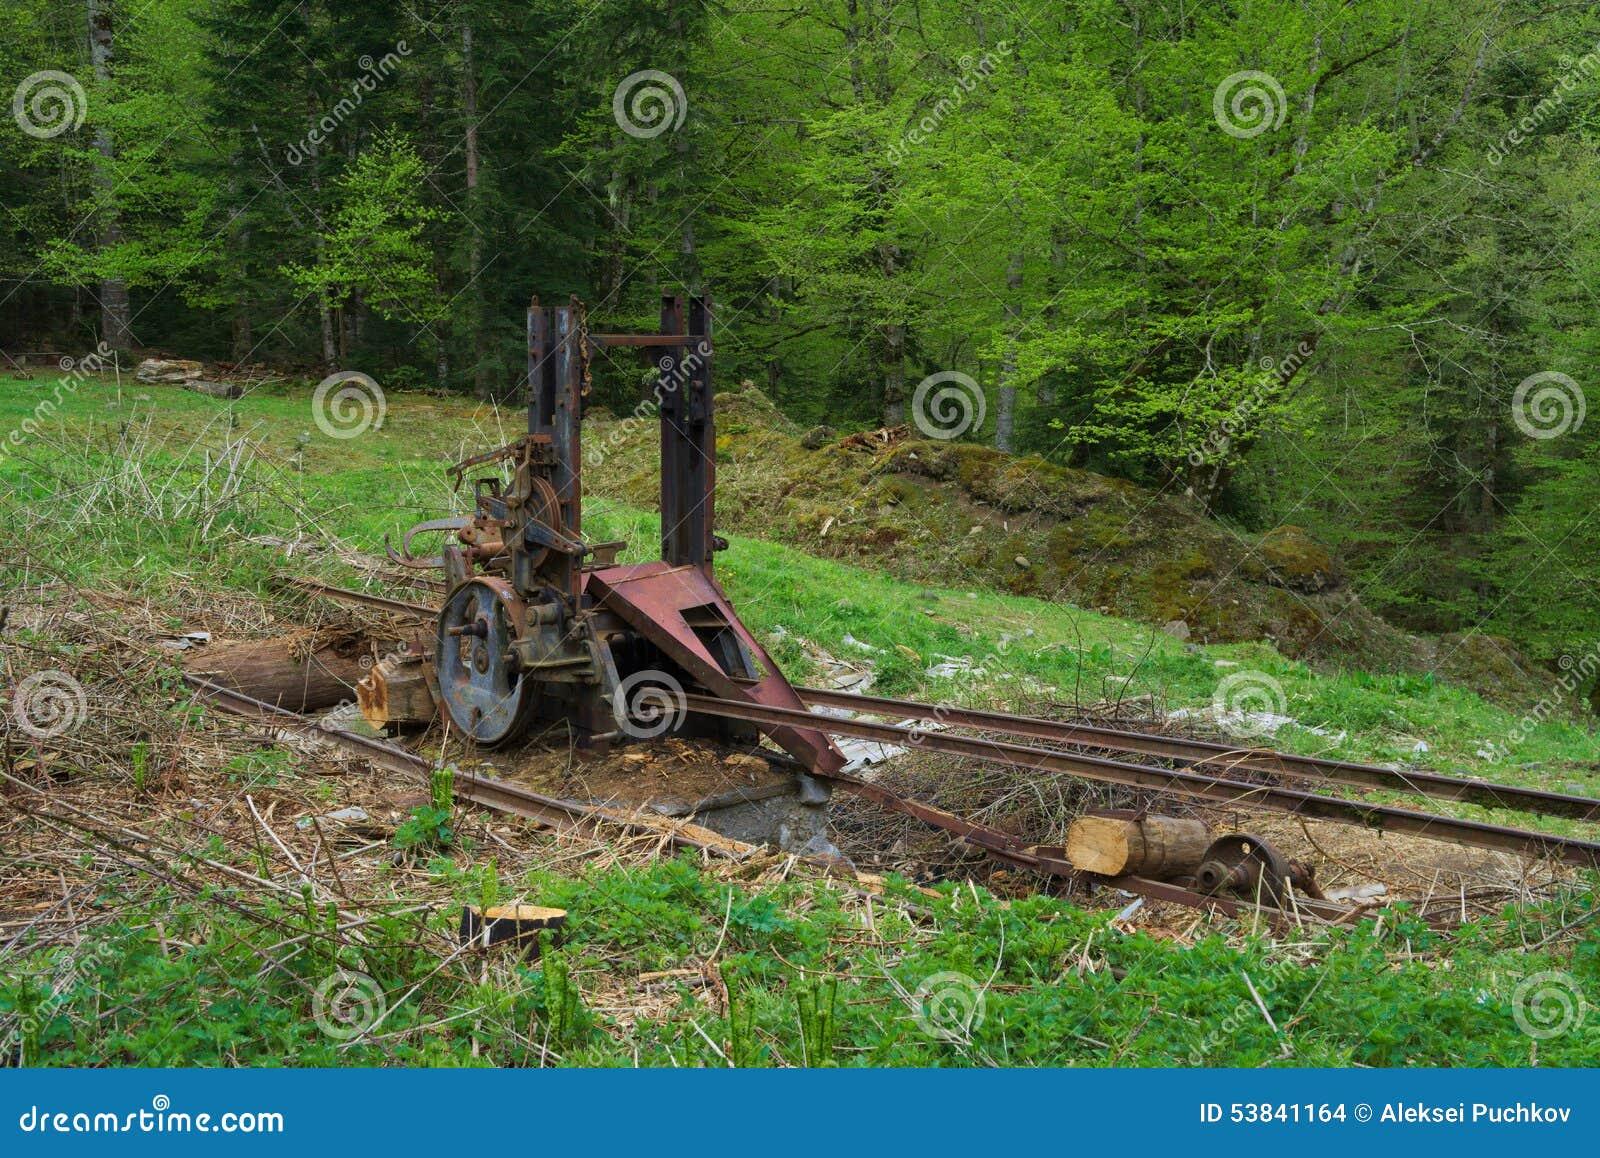 Konstig mekanism i skog